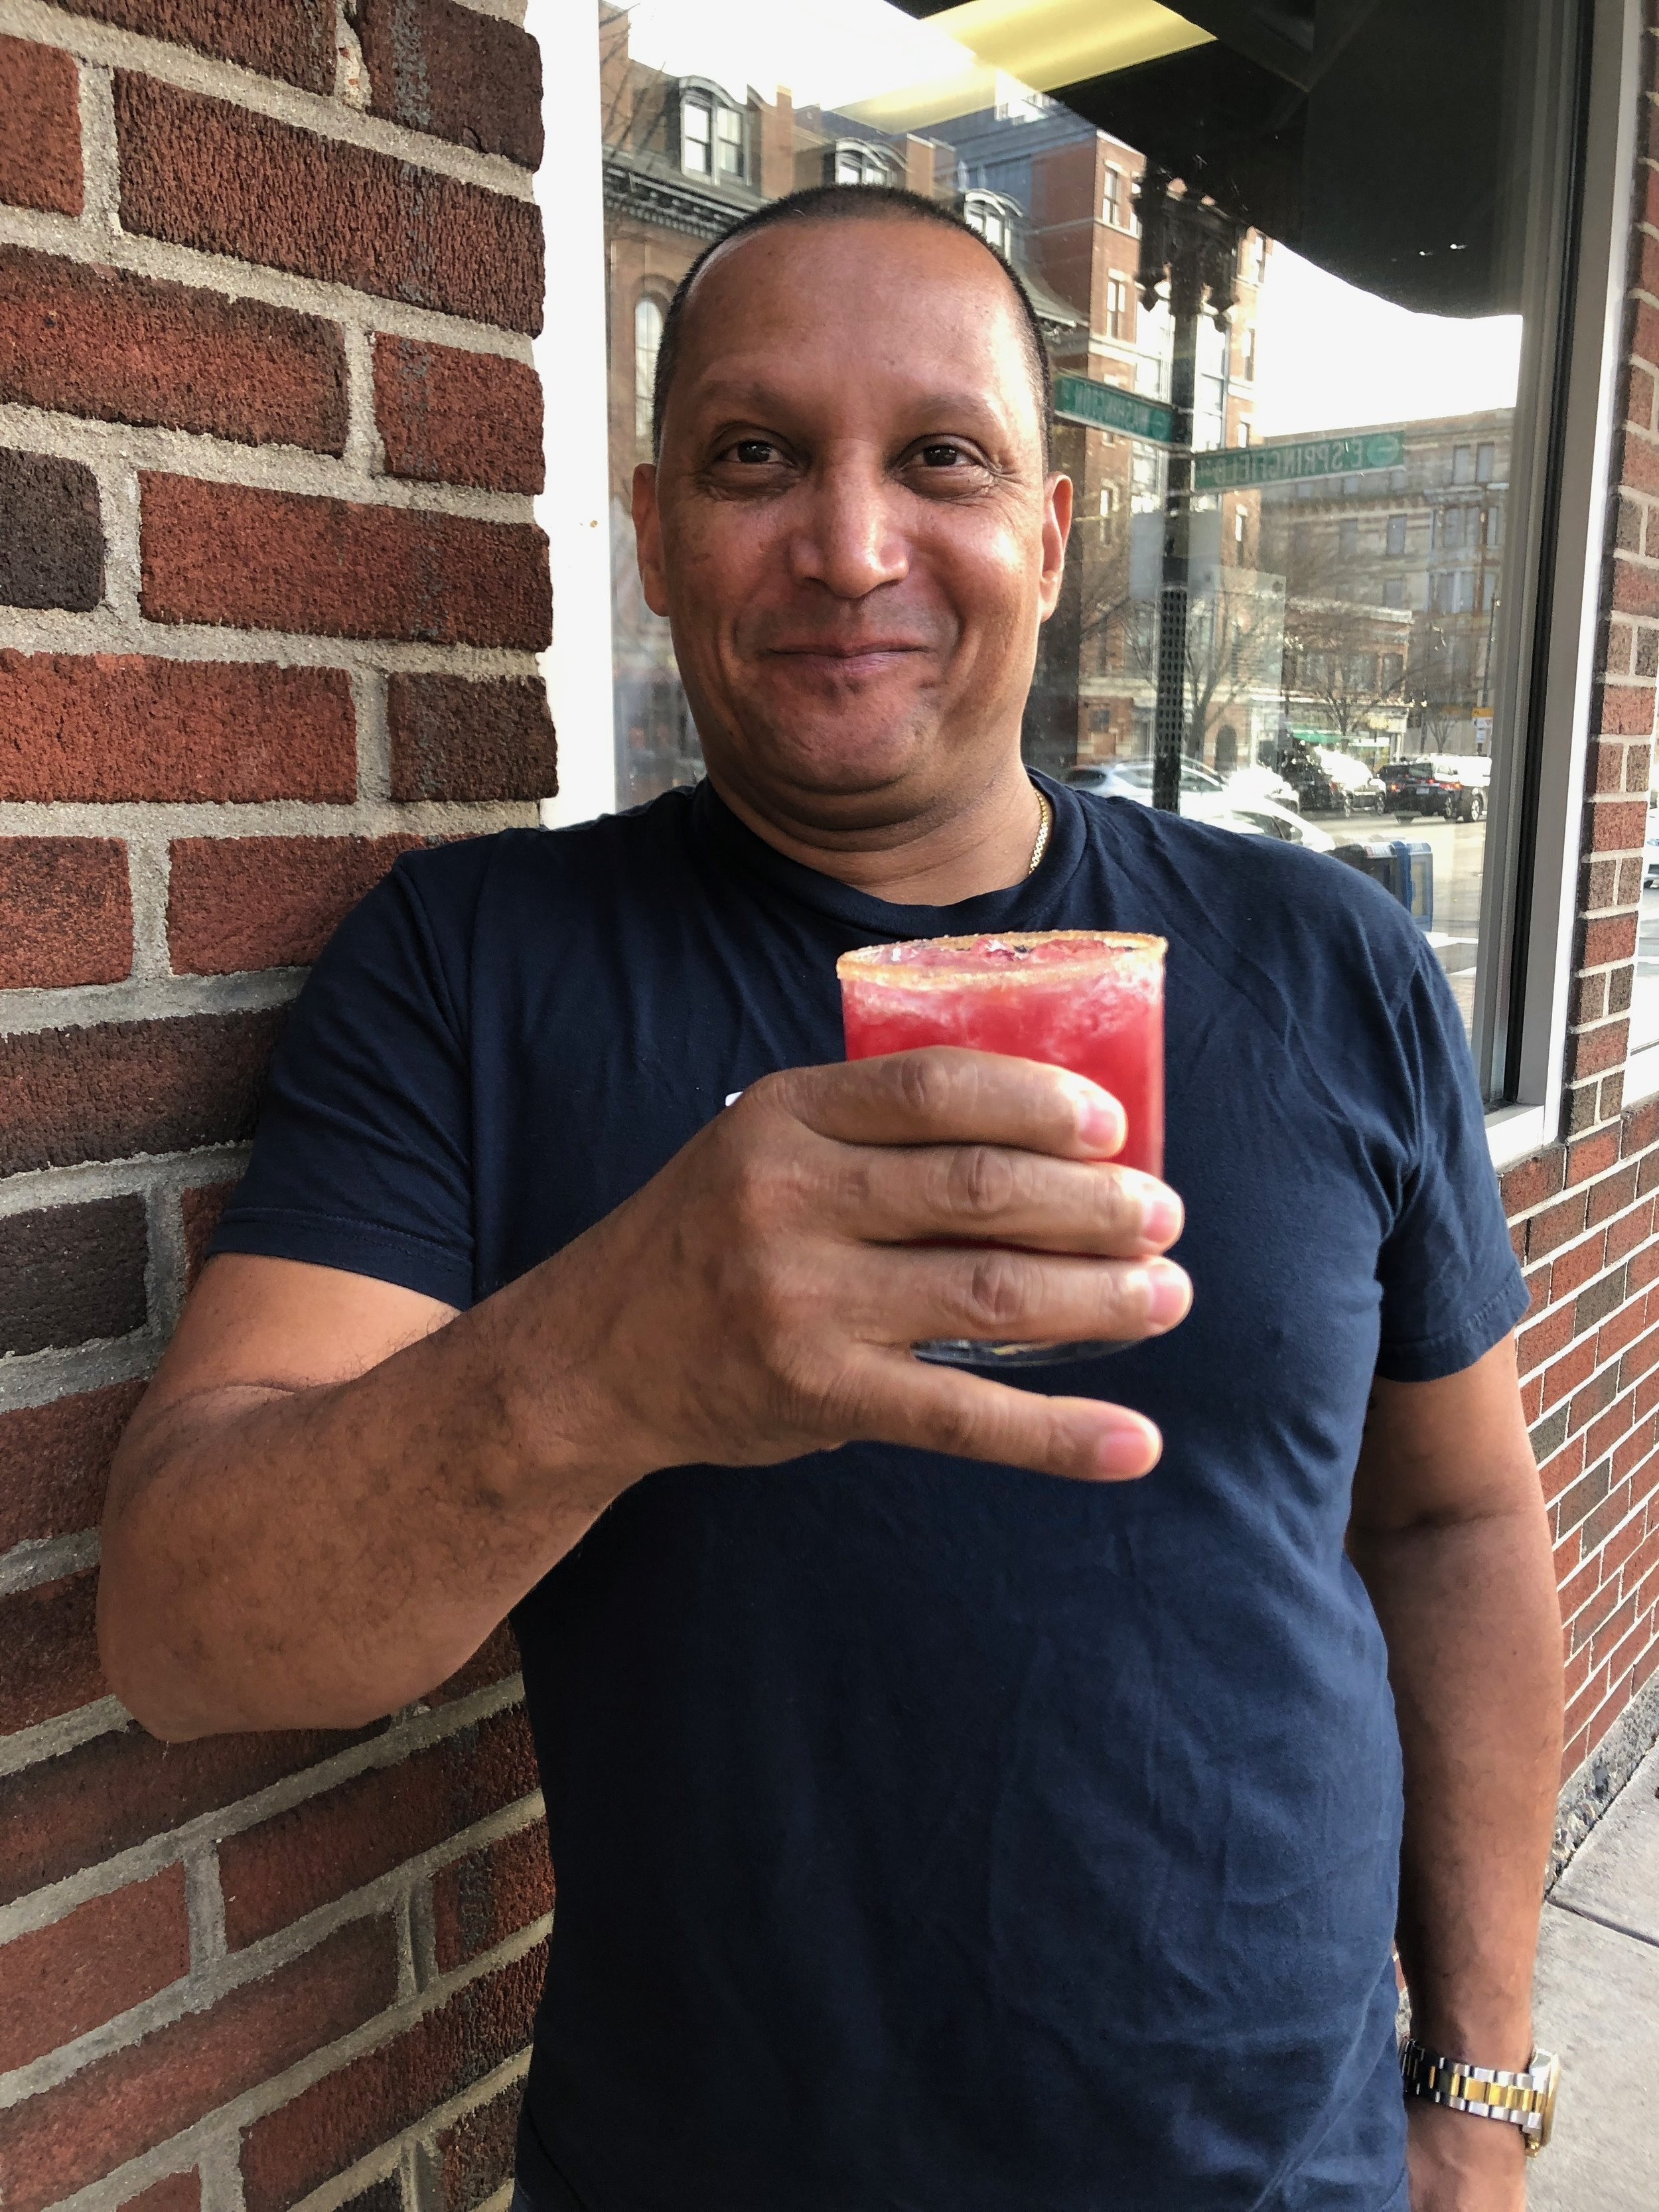 Meet Luis - At Toro since 2005